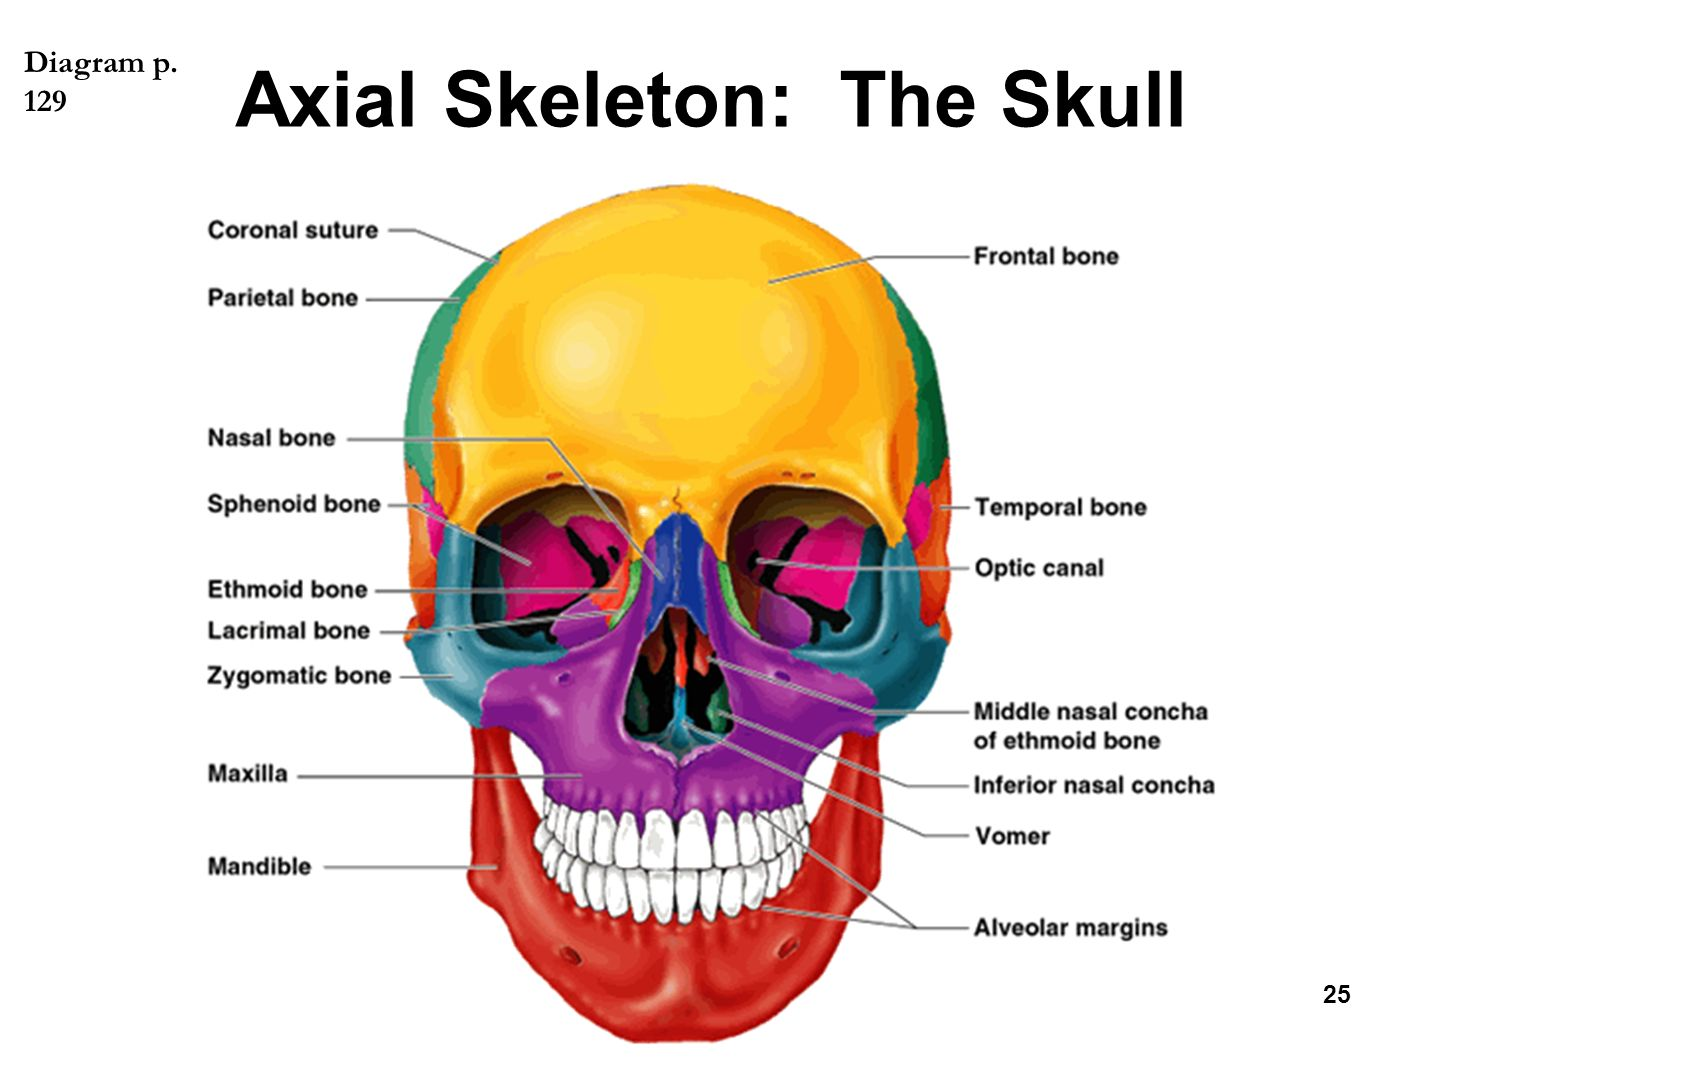 skeleton skull diagram wiring diagramthe skeletal system chapter ppt video online downloadaxial skeleton the skull